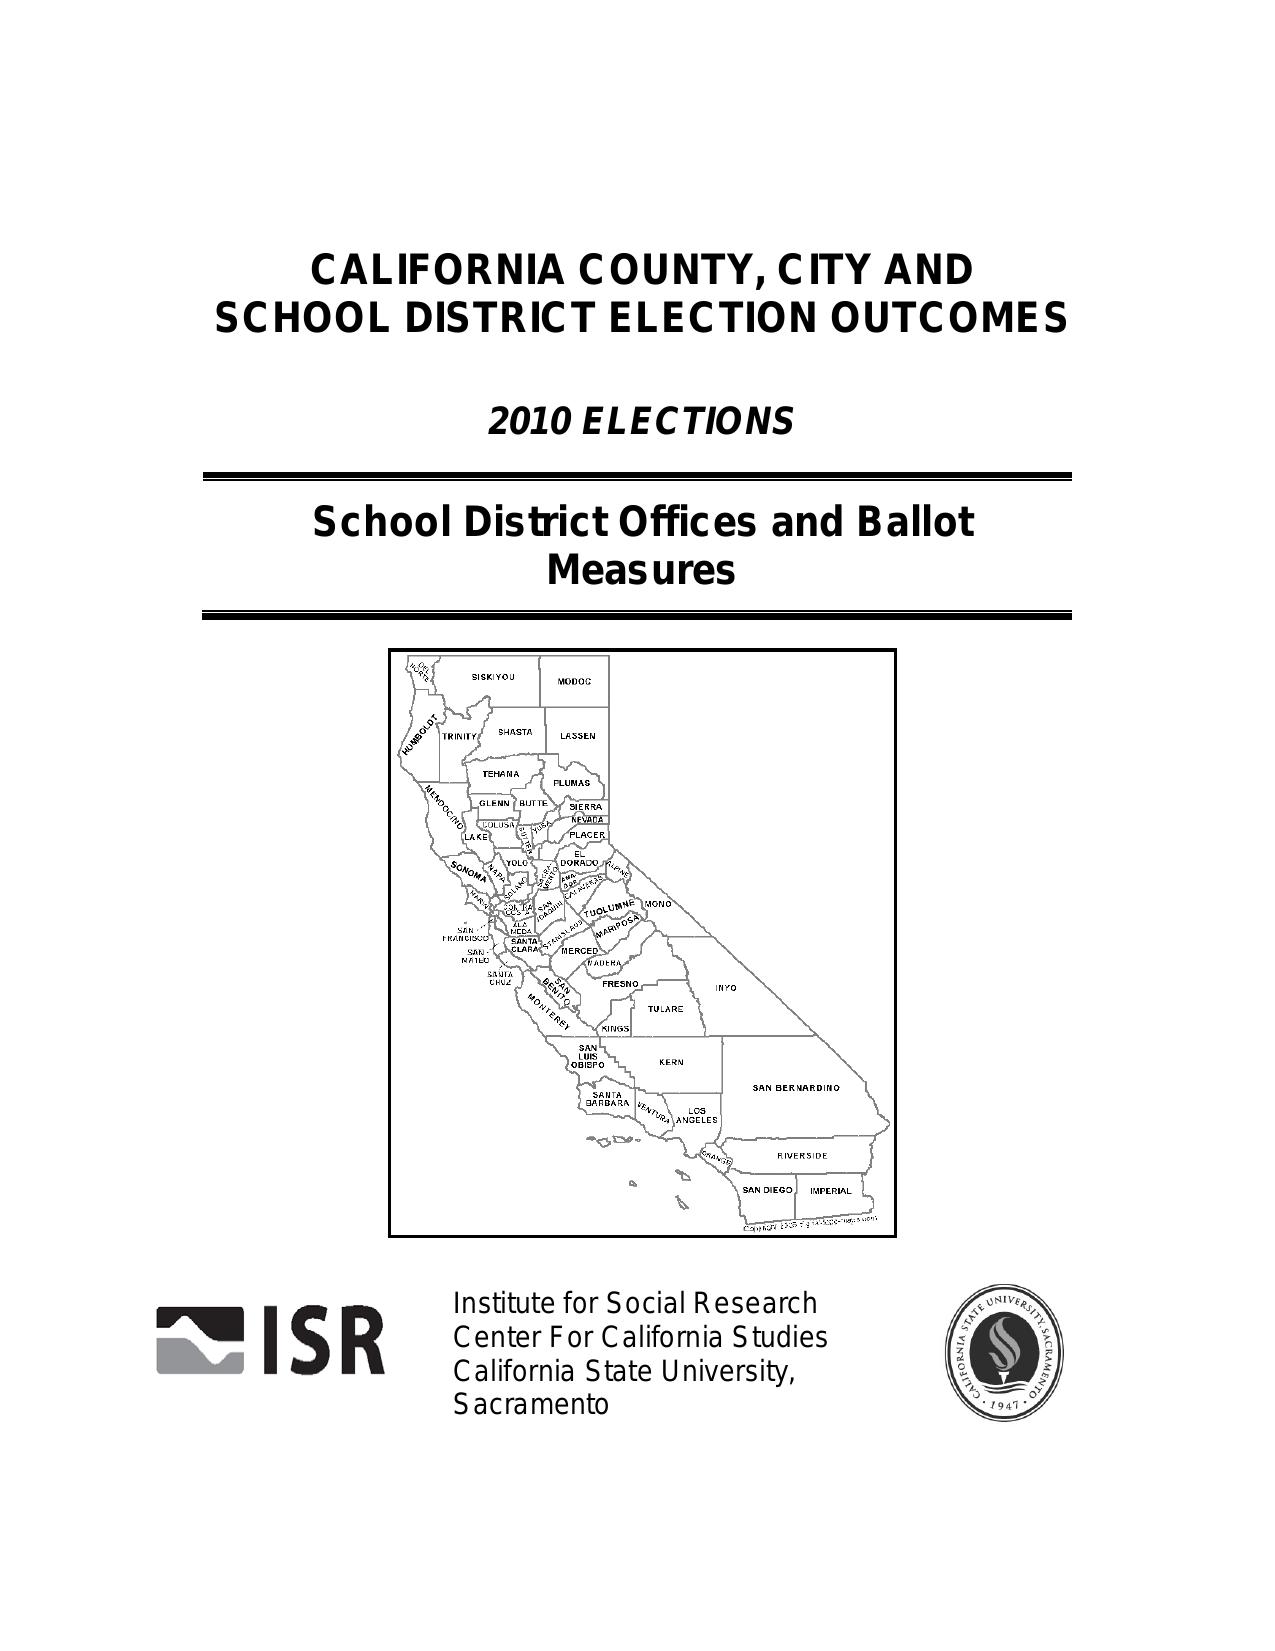 Ana Maria Polvorosa Hot california county, city and school district election